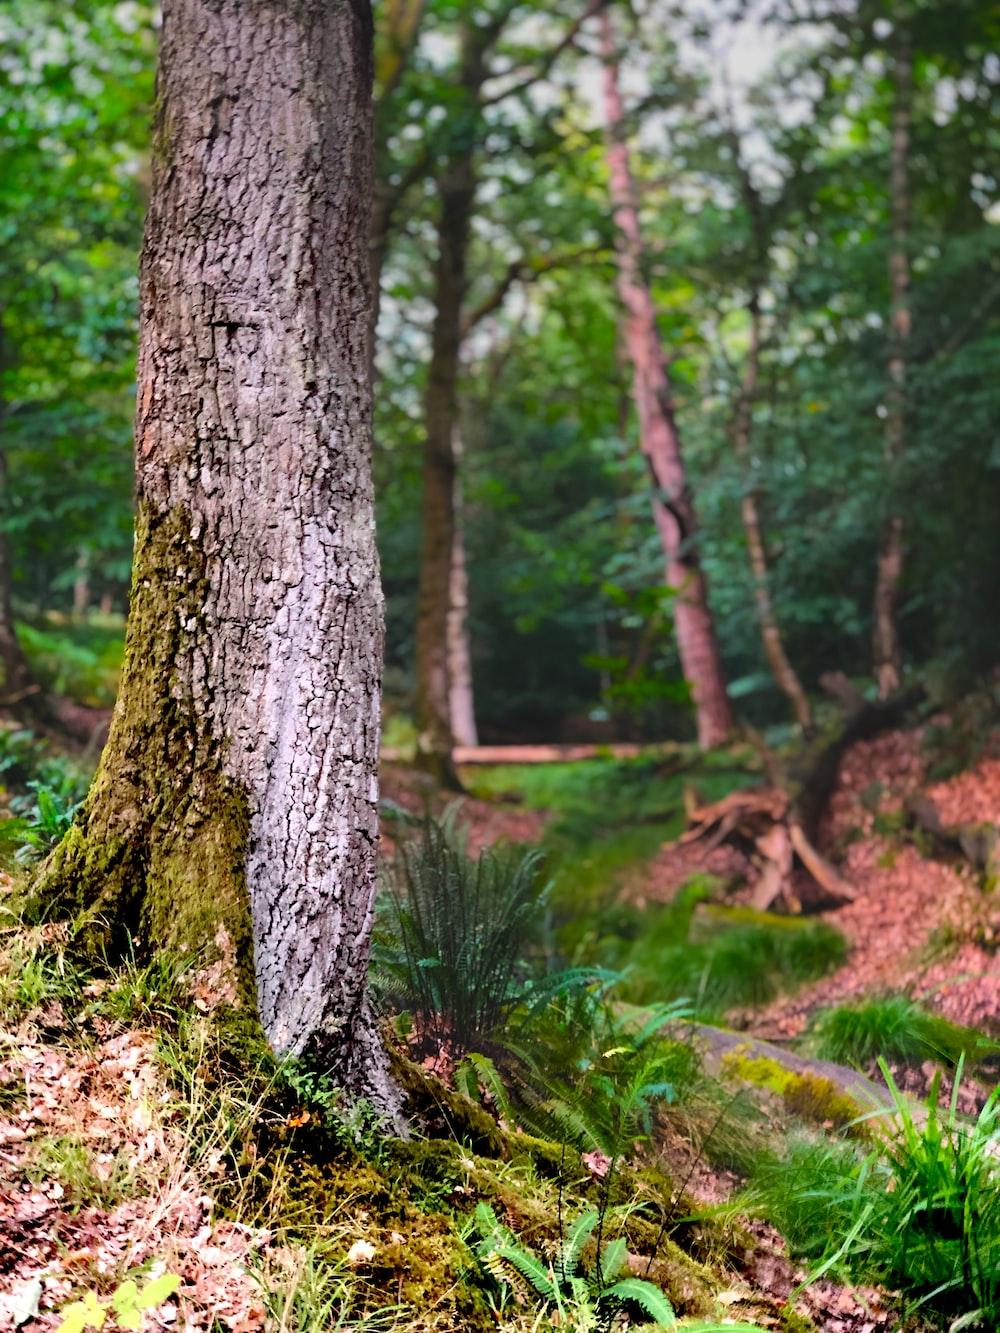 brown tree trunk on green grass field